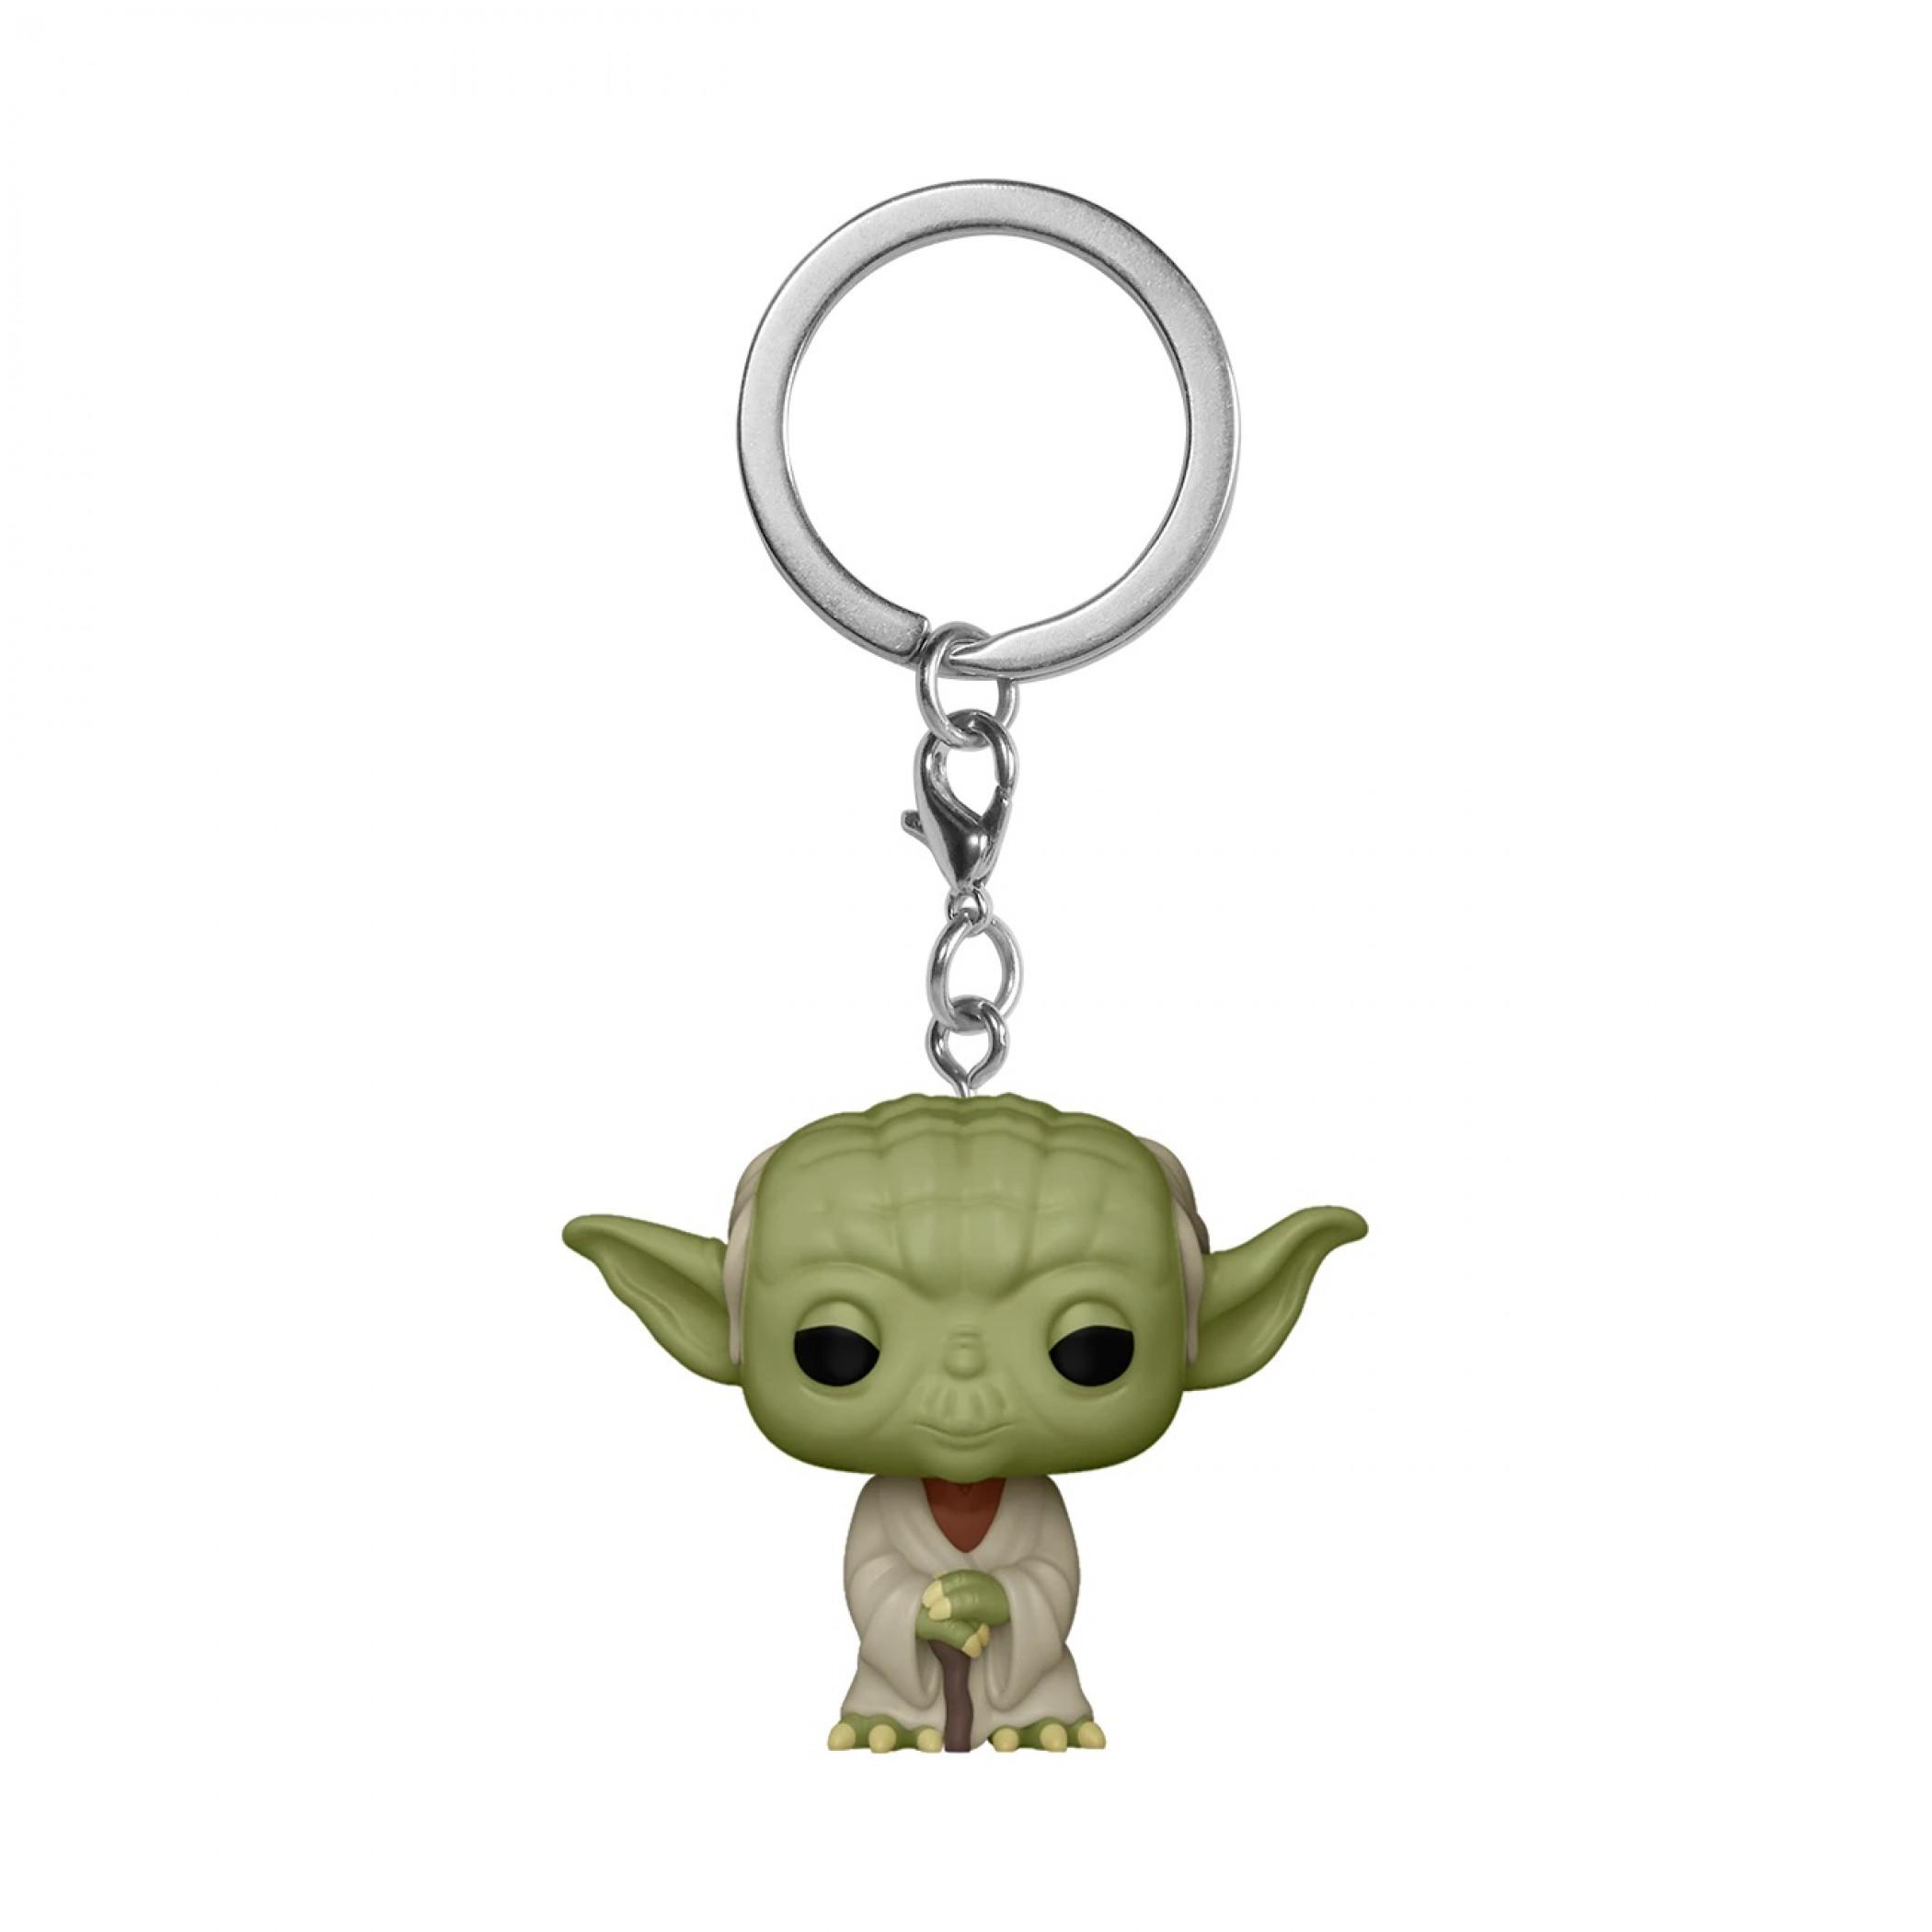 Star Wars Classics Yoda Funko Pop! Keychain